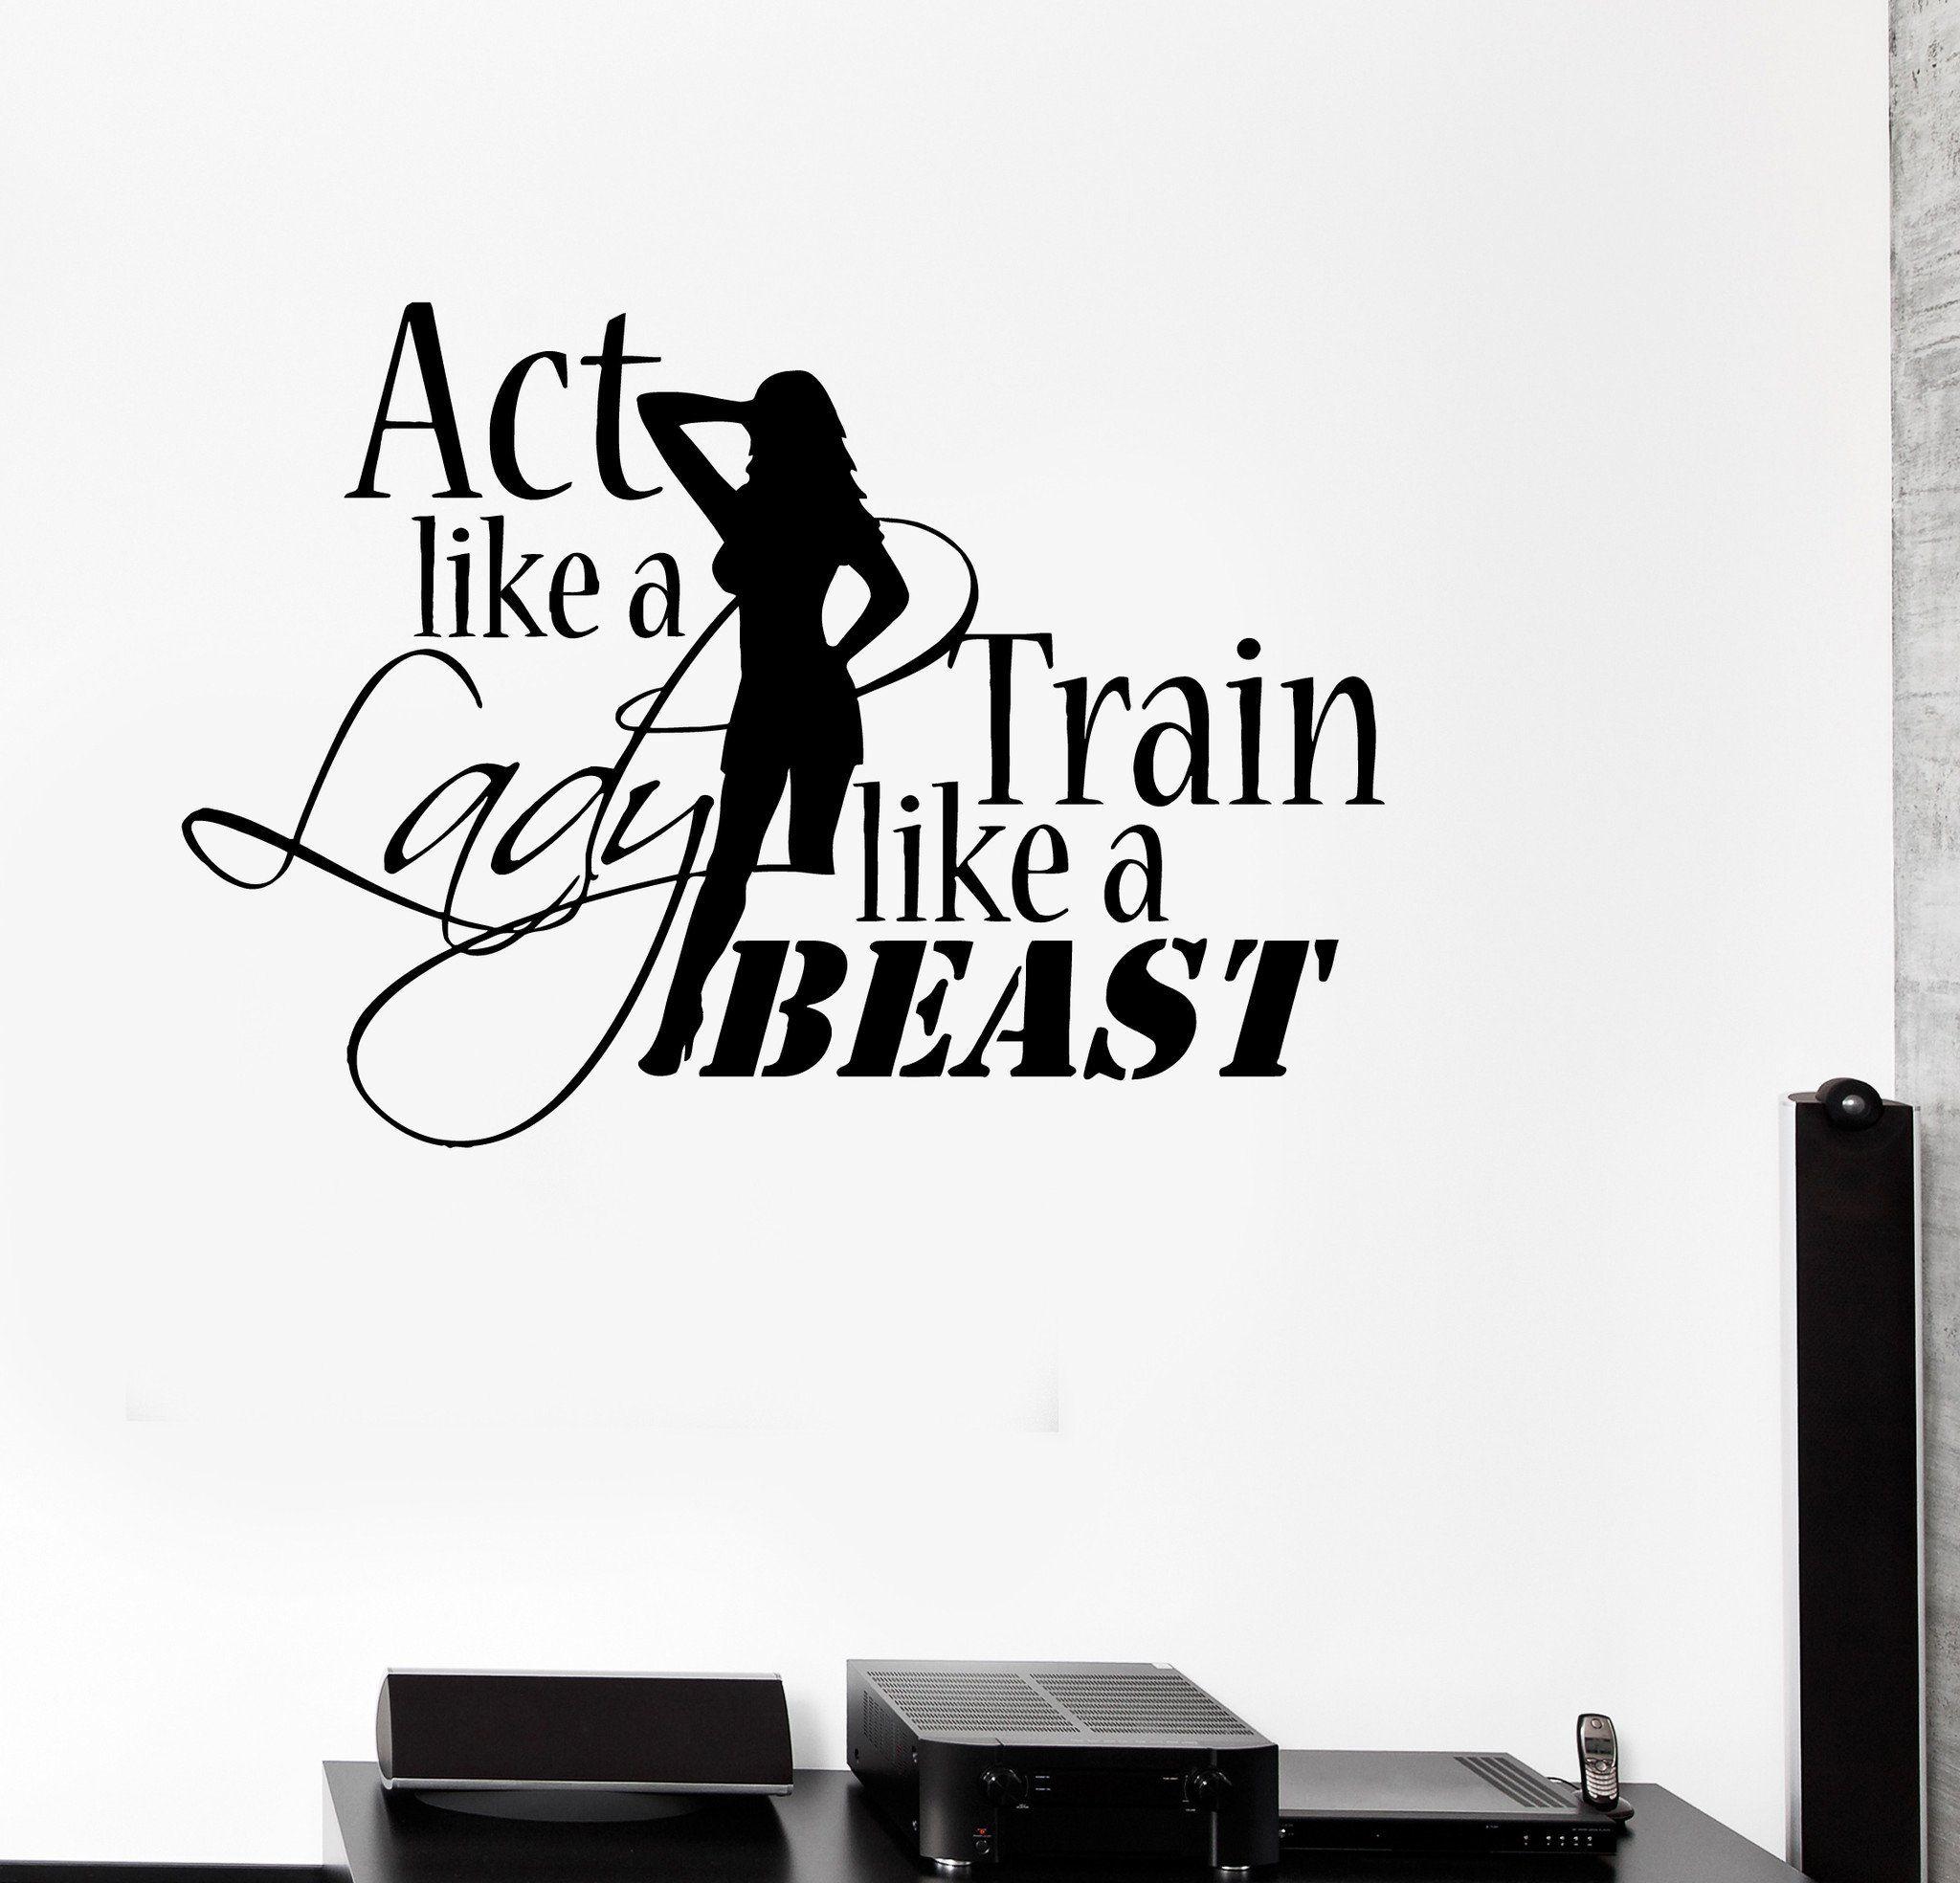 Vinyl decal sports quote motivation bodybuilding gym woman